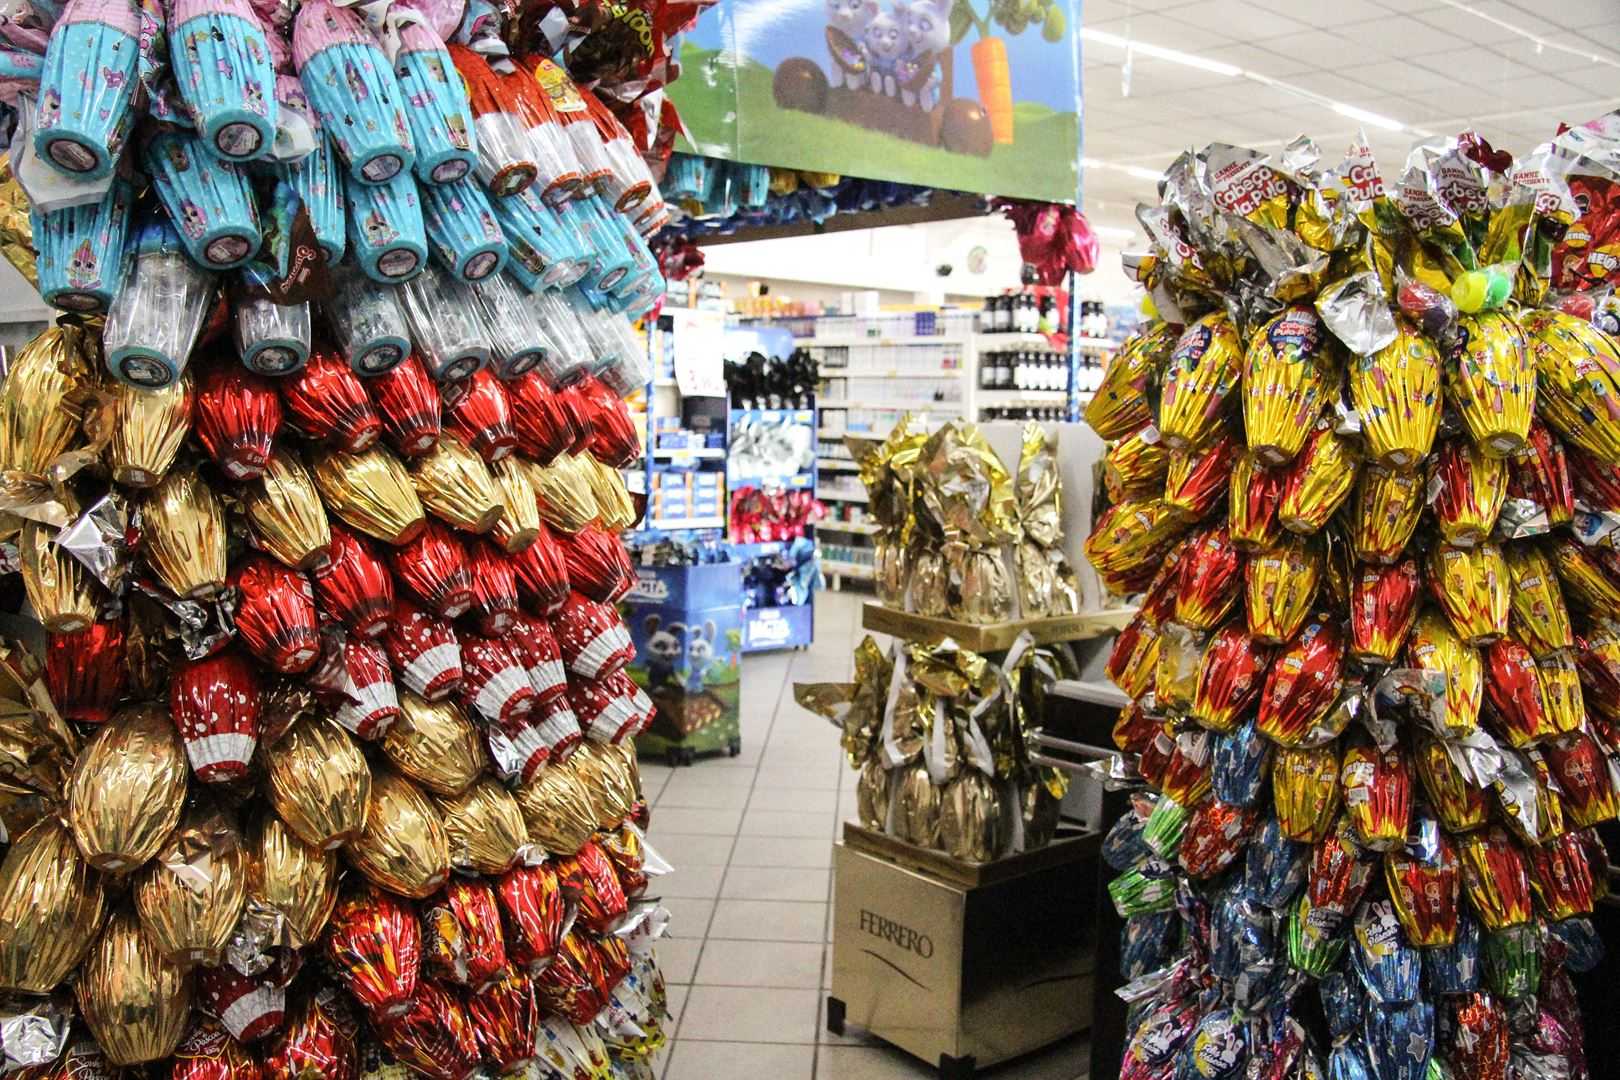 BOMBINHAS - PROCON Bombinhas realiza pesquisa de preços para a Páscoa